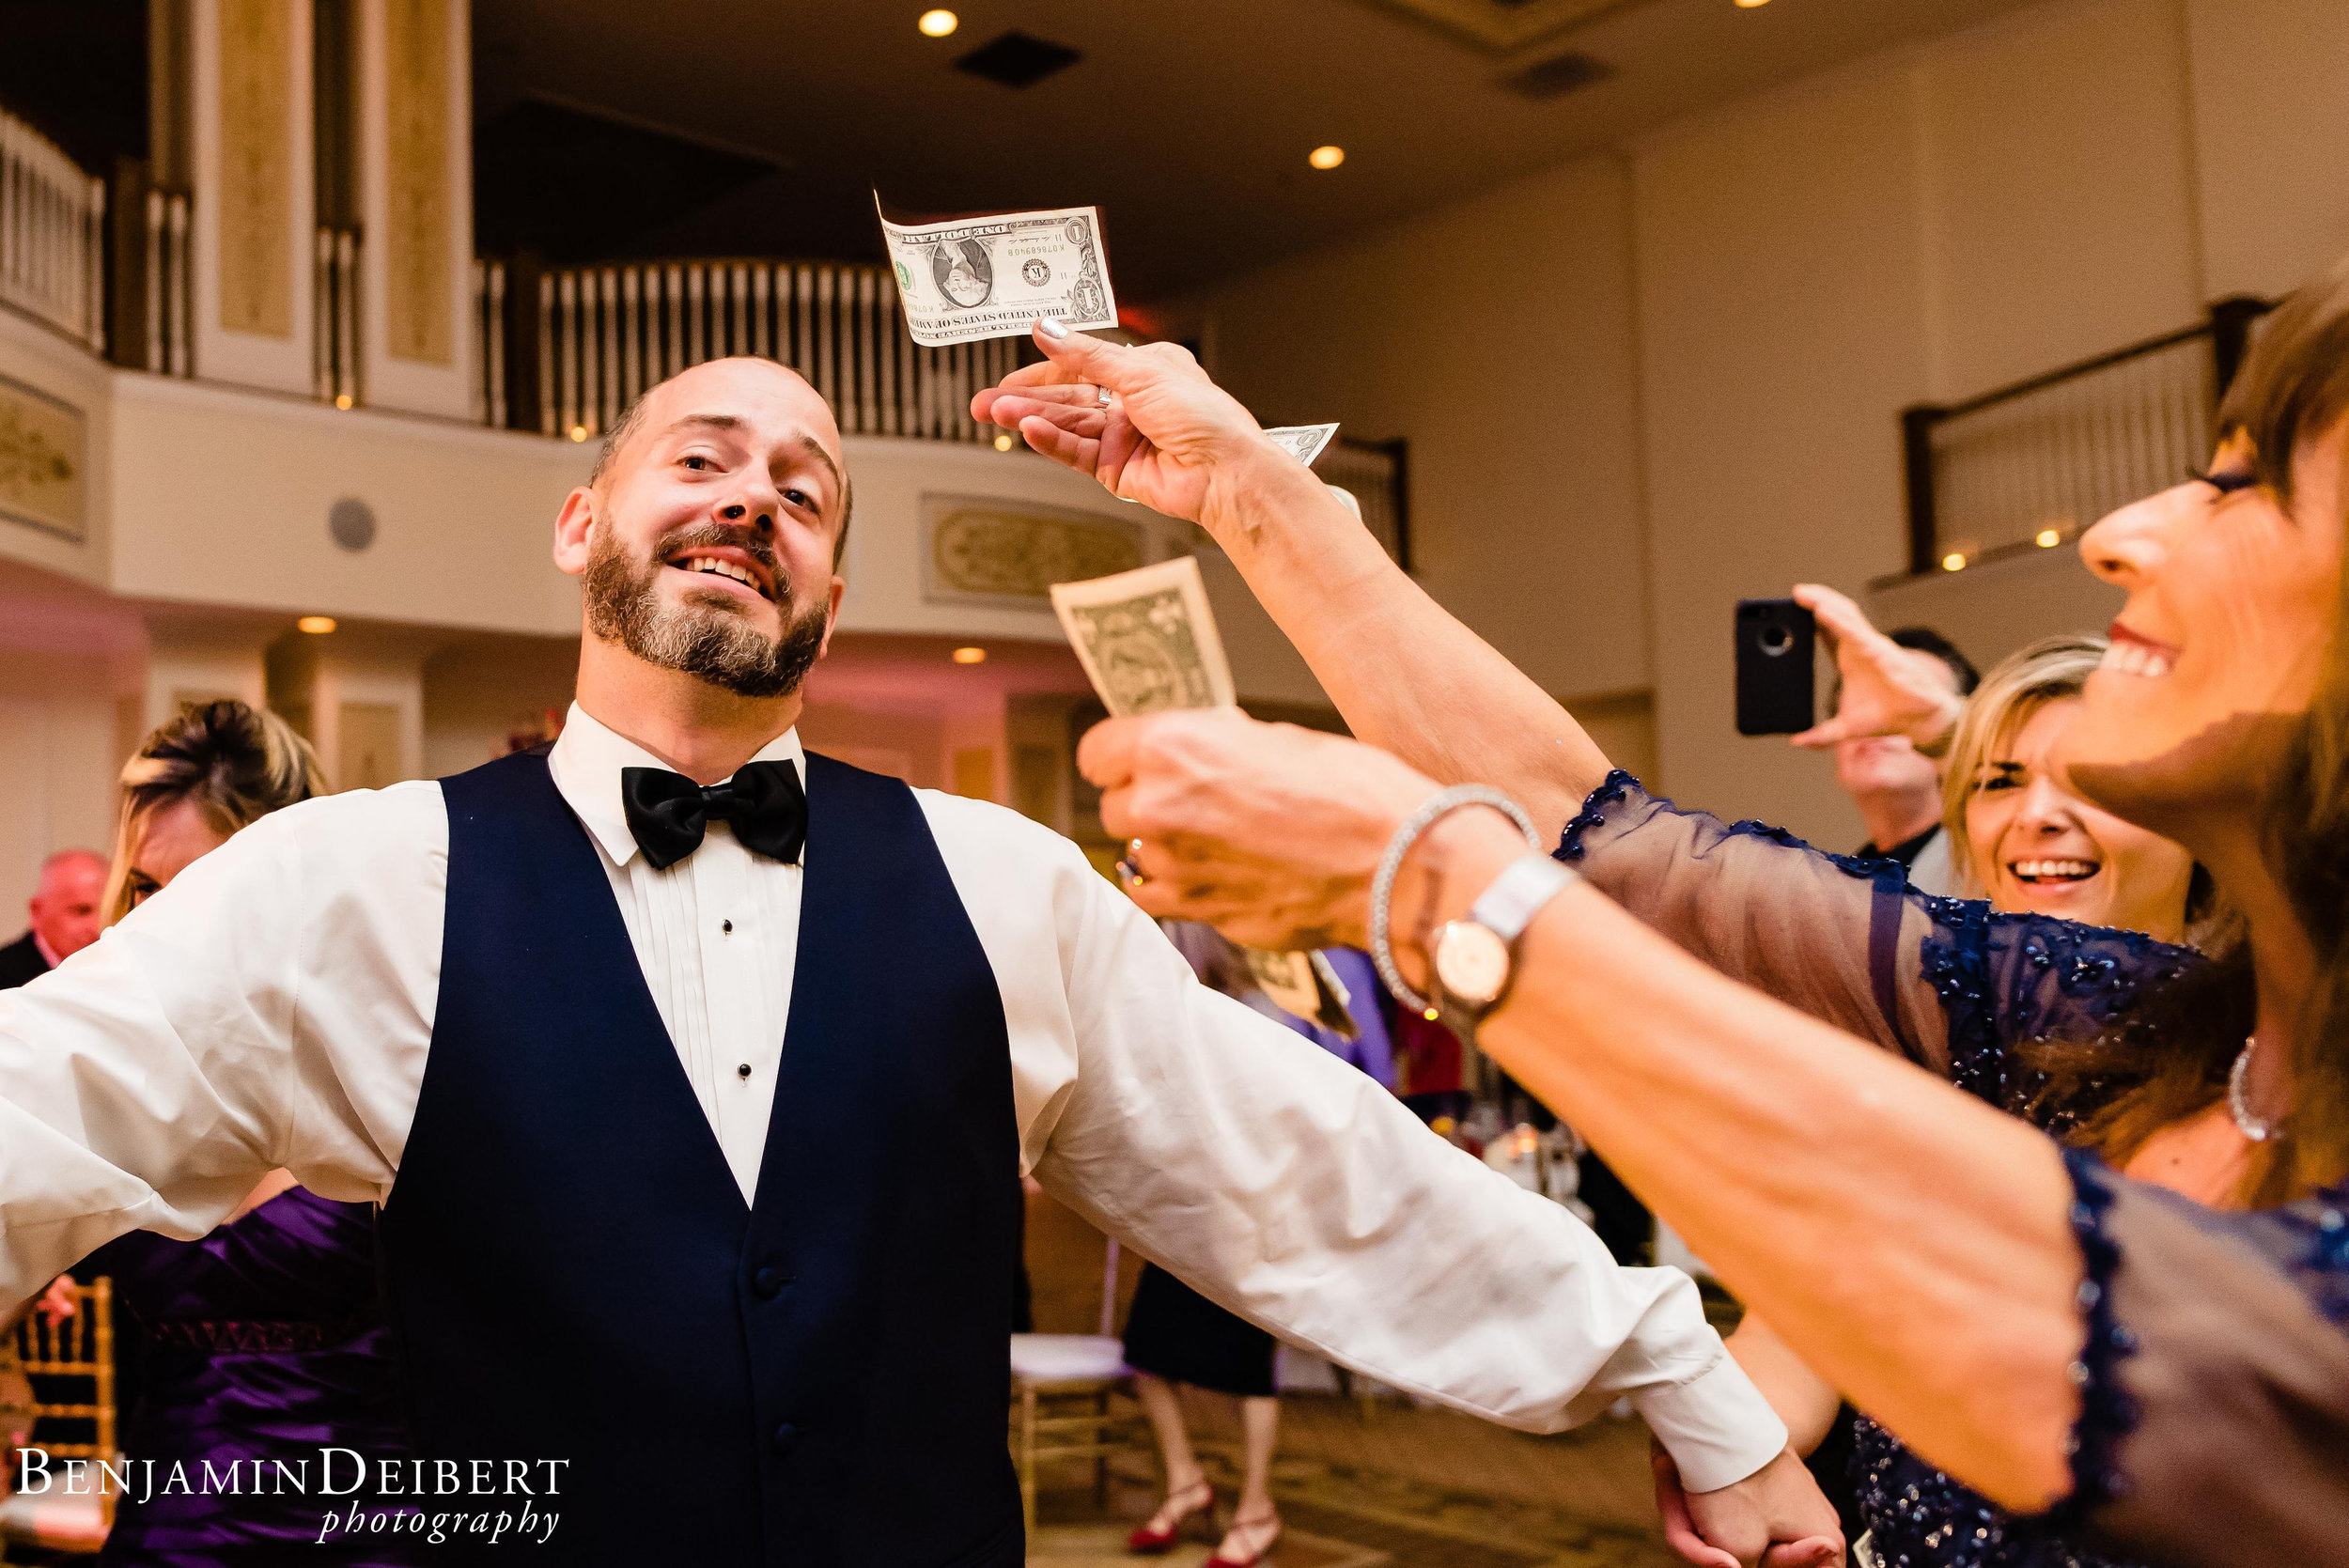 AmandaandElliott_TheCarriageHouse_Wedding-68.jpg